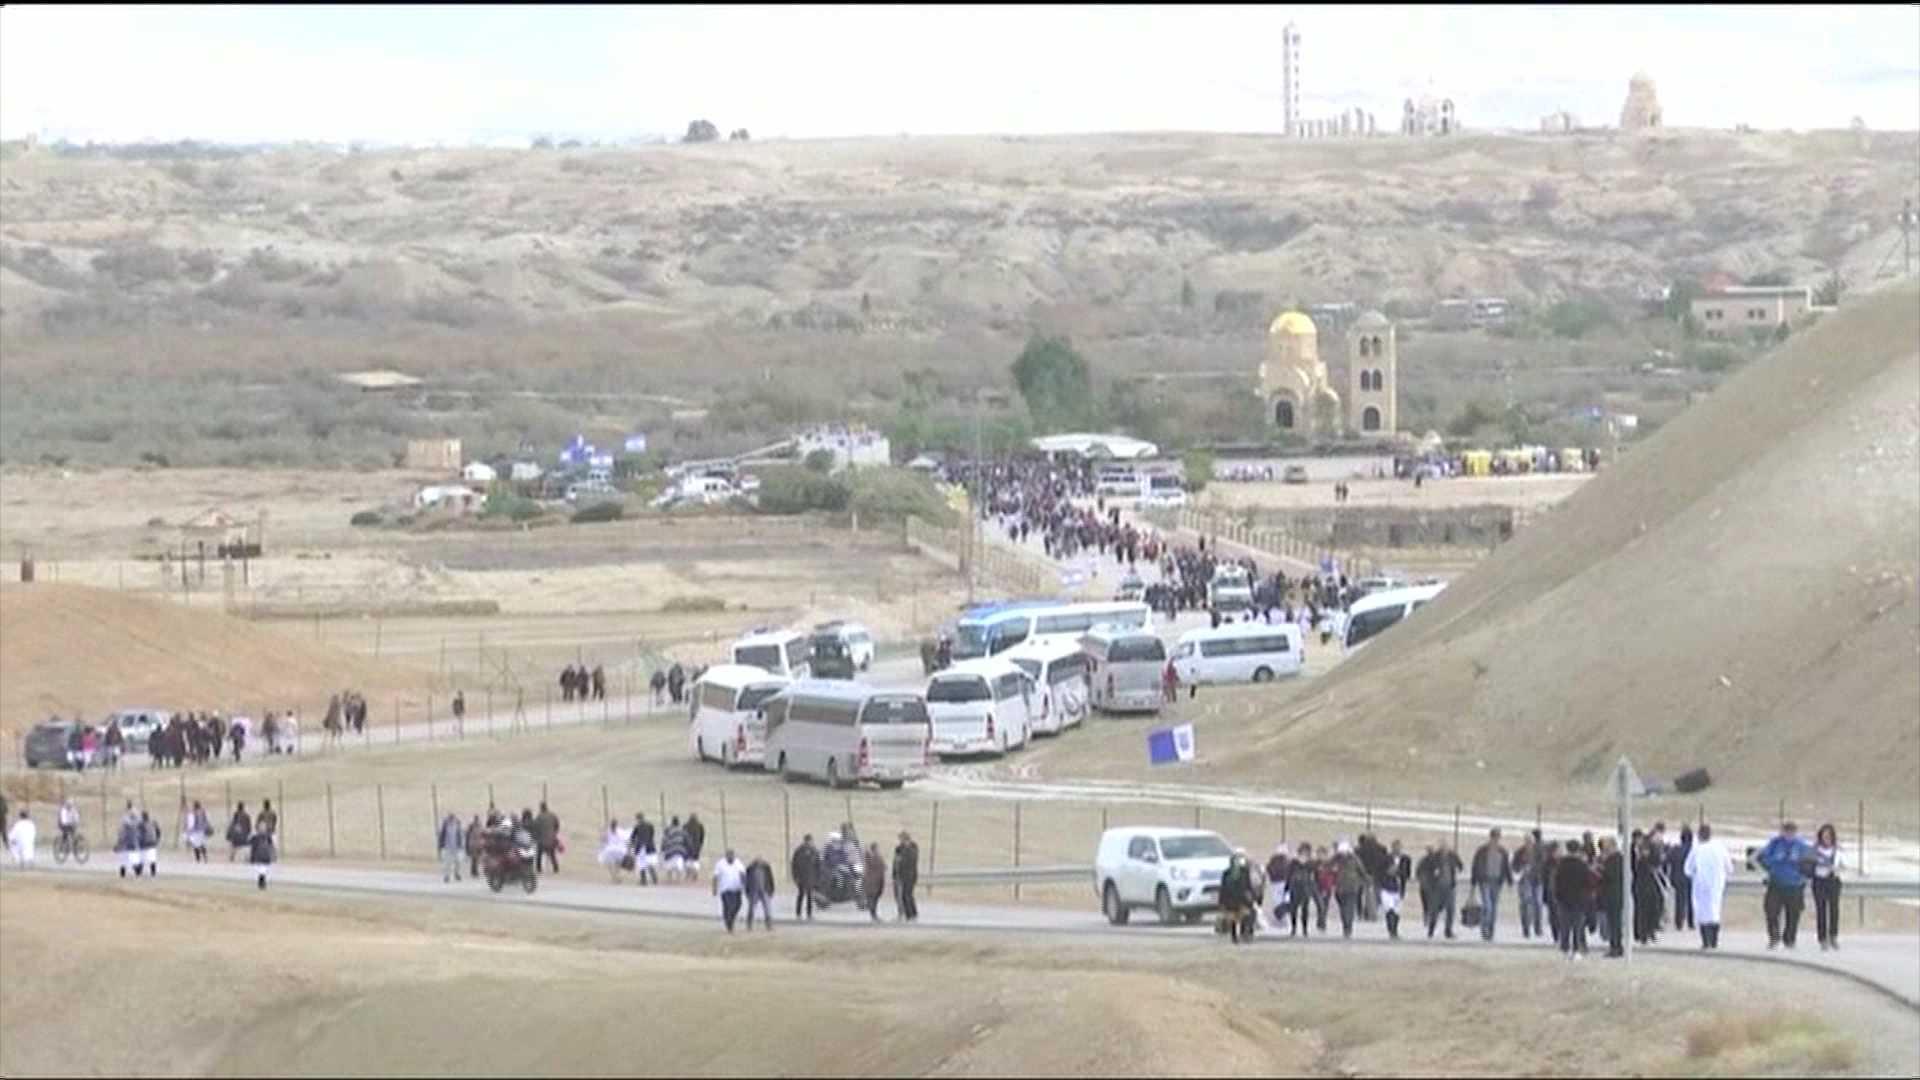 The Epiphany celebration is celebrated by the Orthodox community of the world